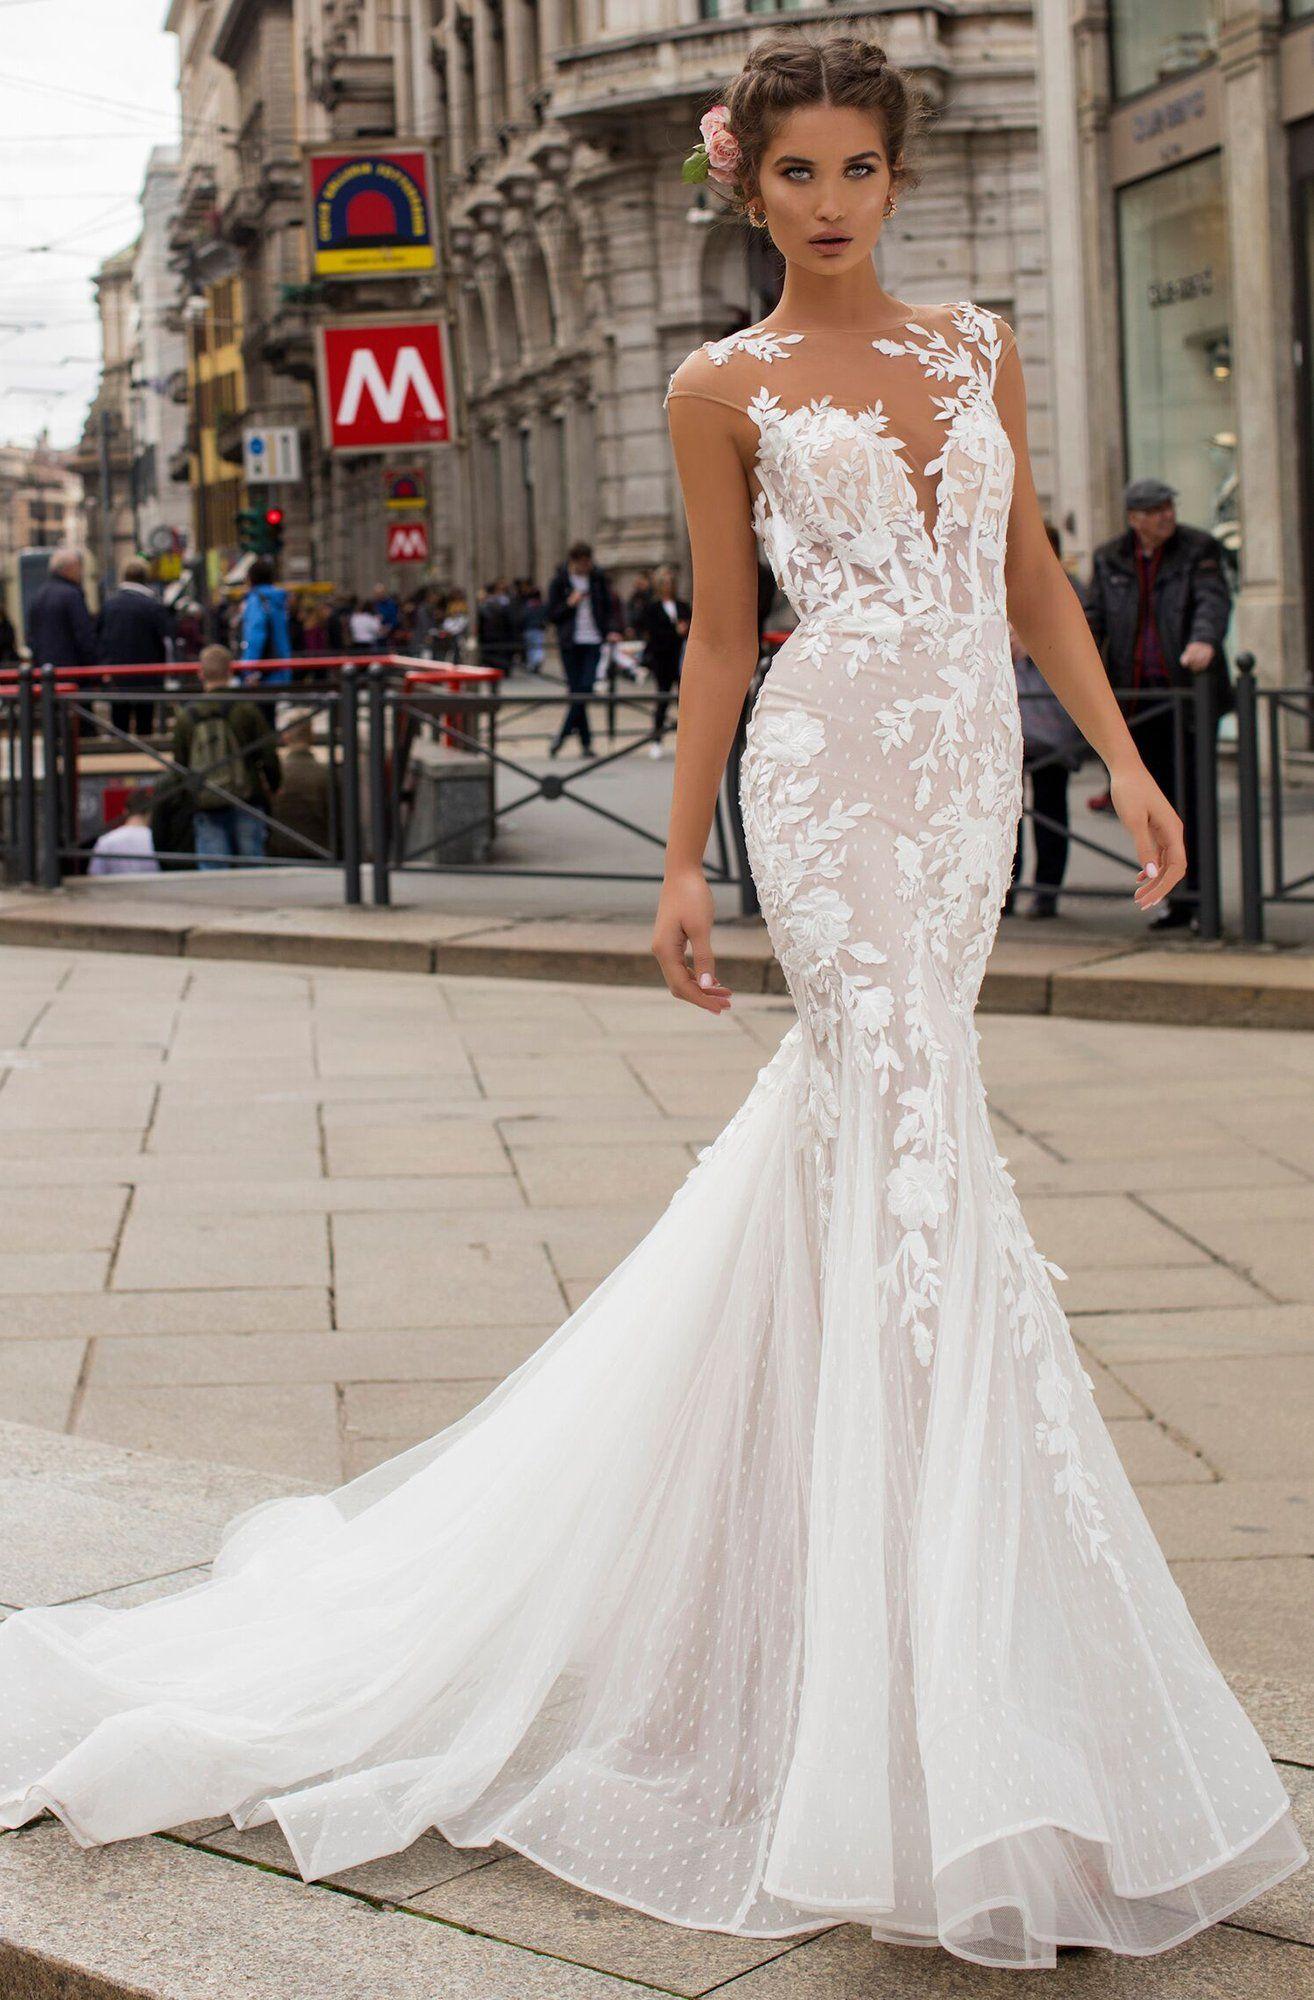 Tarik Ediz 50406 Floral Lace Mermaid Dress With Train Wedding Dresses Summer Wedding Dress Beach Mermaid Dresses [ 2000 x 1314 Pixel ]